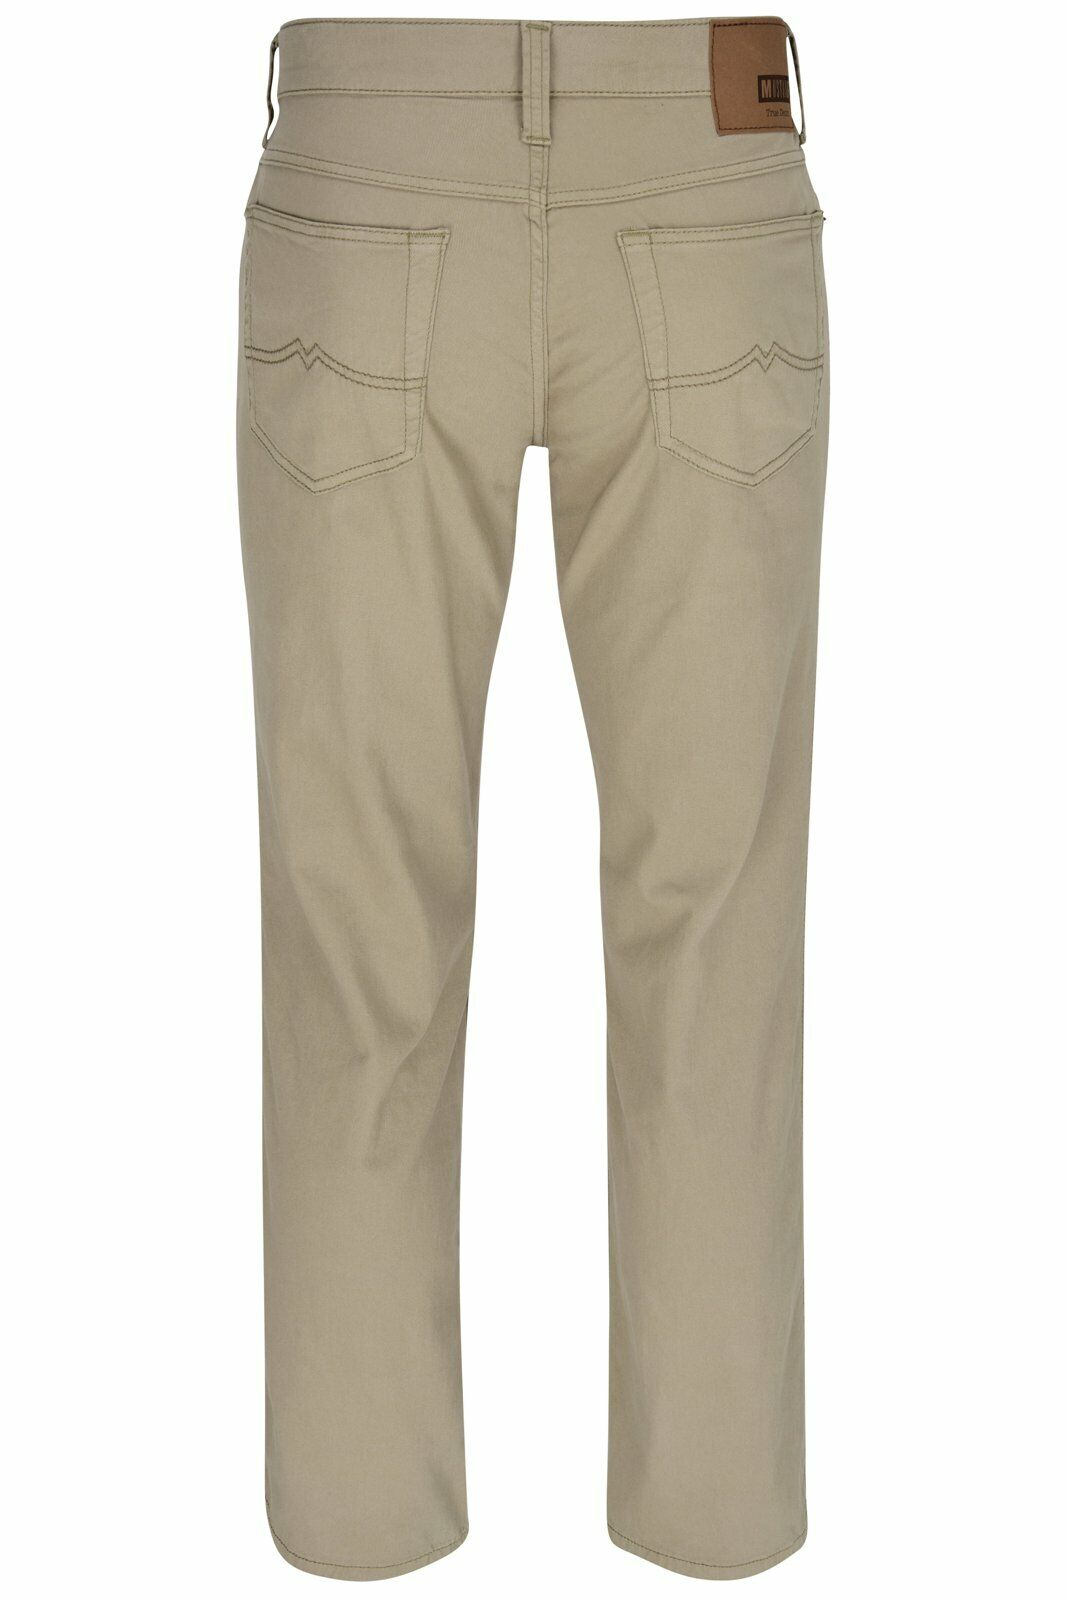 Mustang Oklahoma (Tramper) Herren Jeans / Beige / Sommer-Jeans